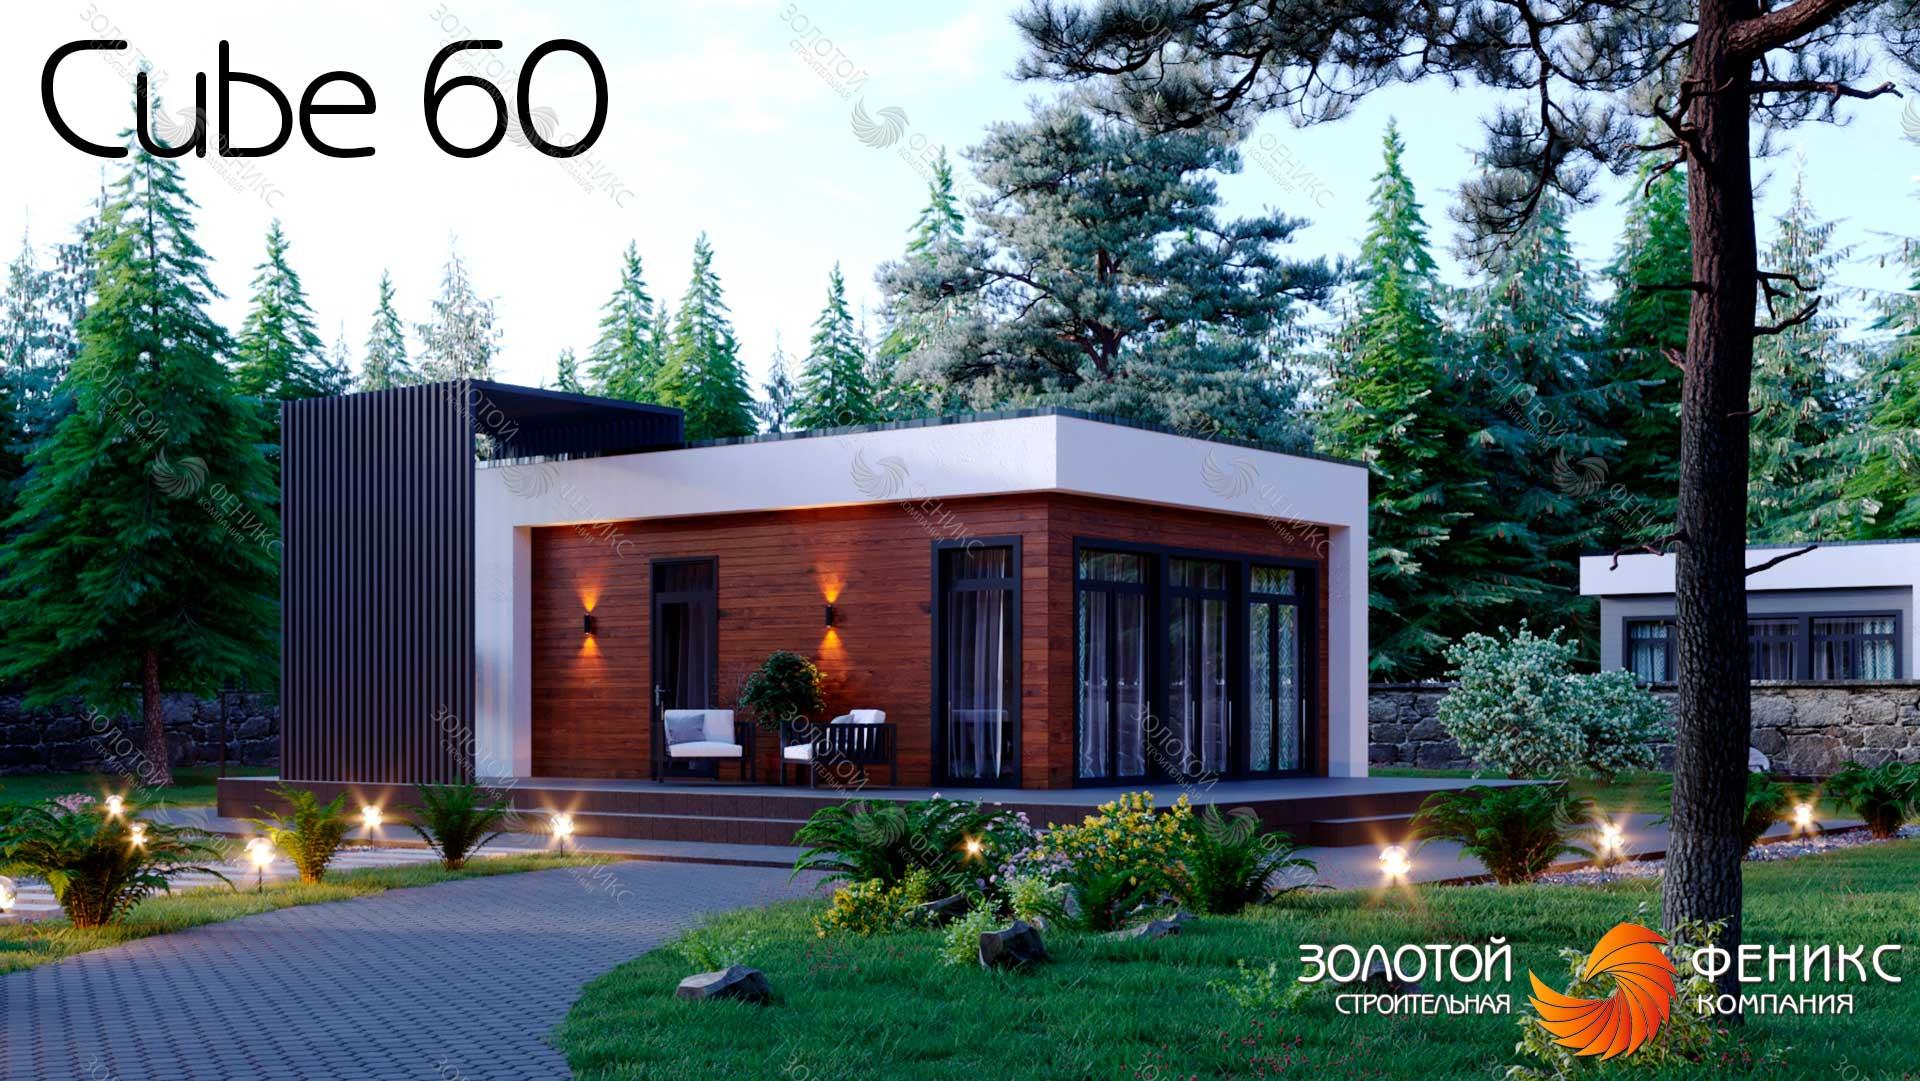 Cube 60